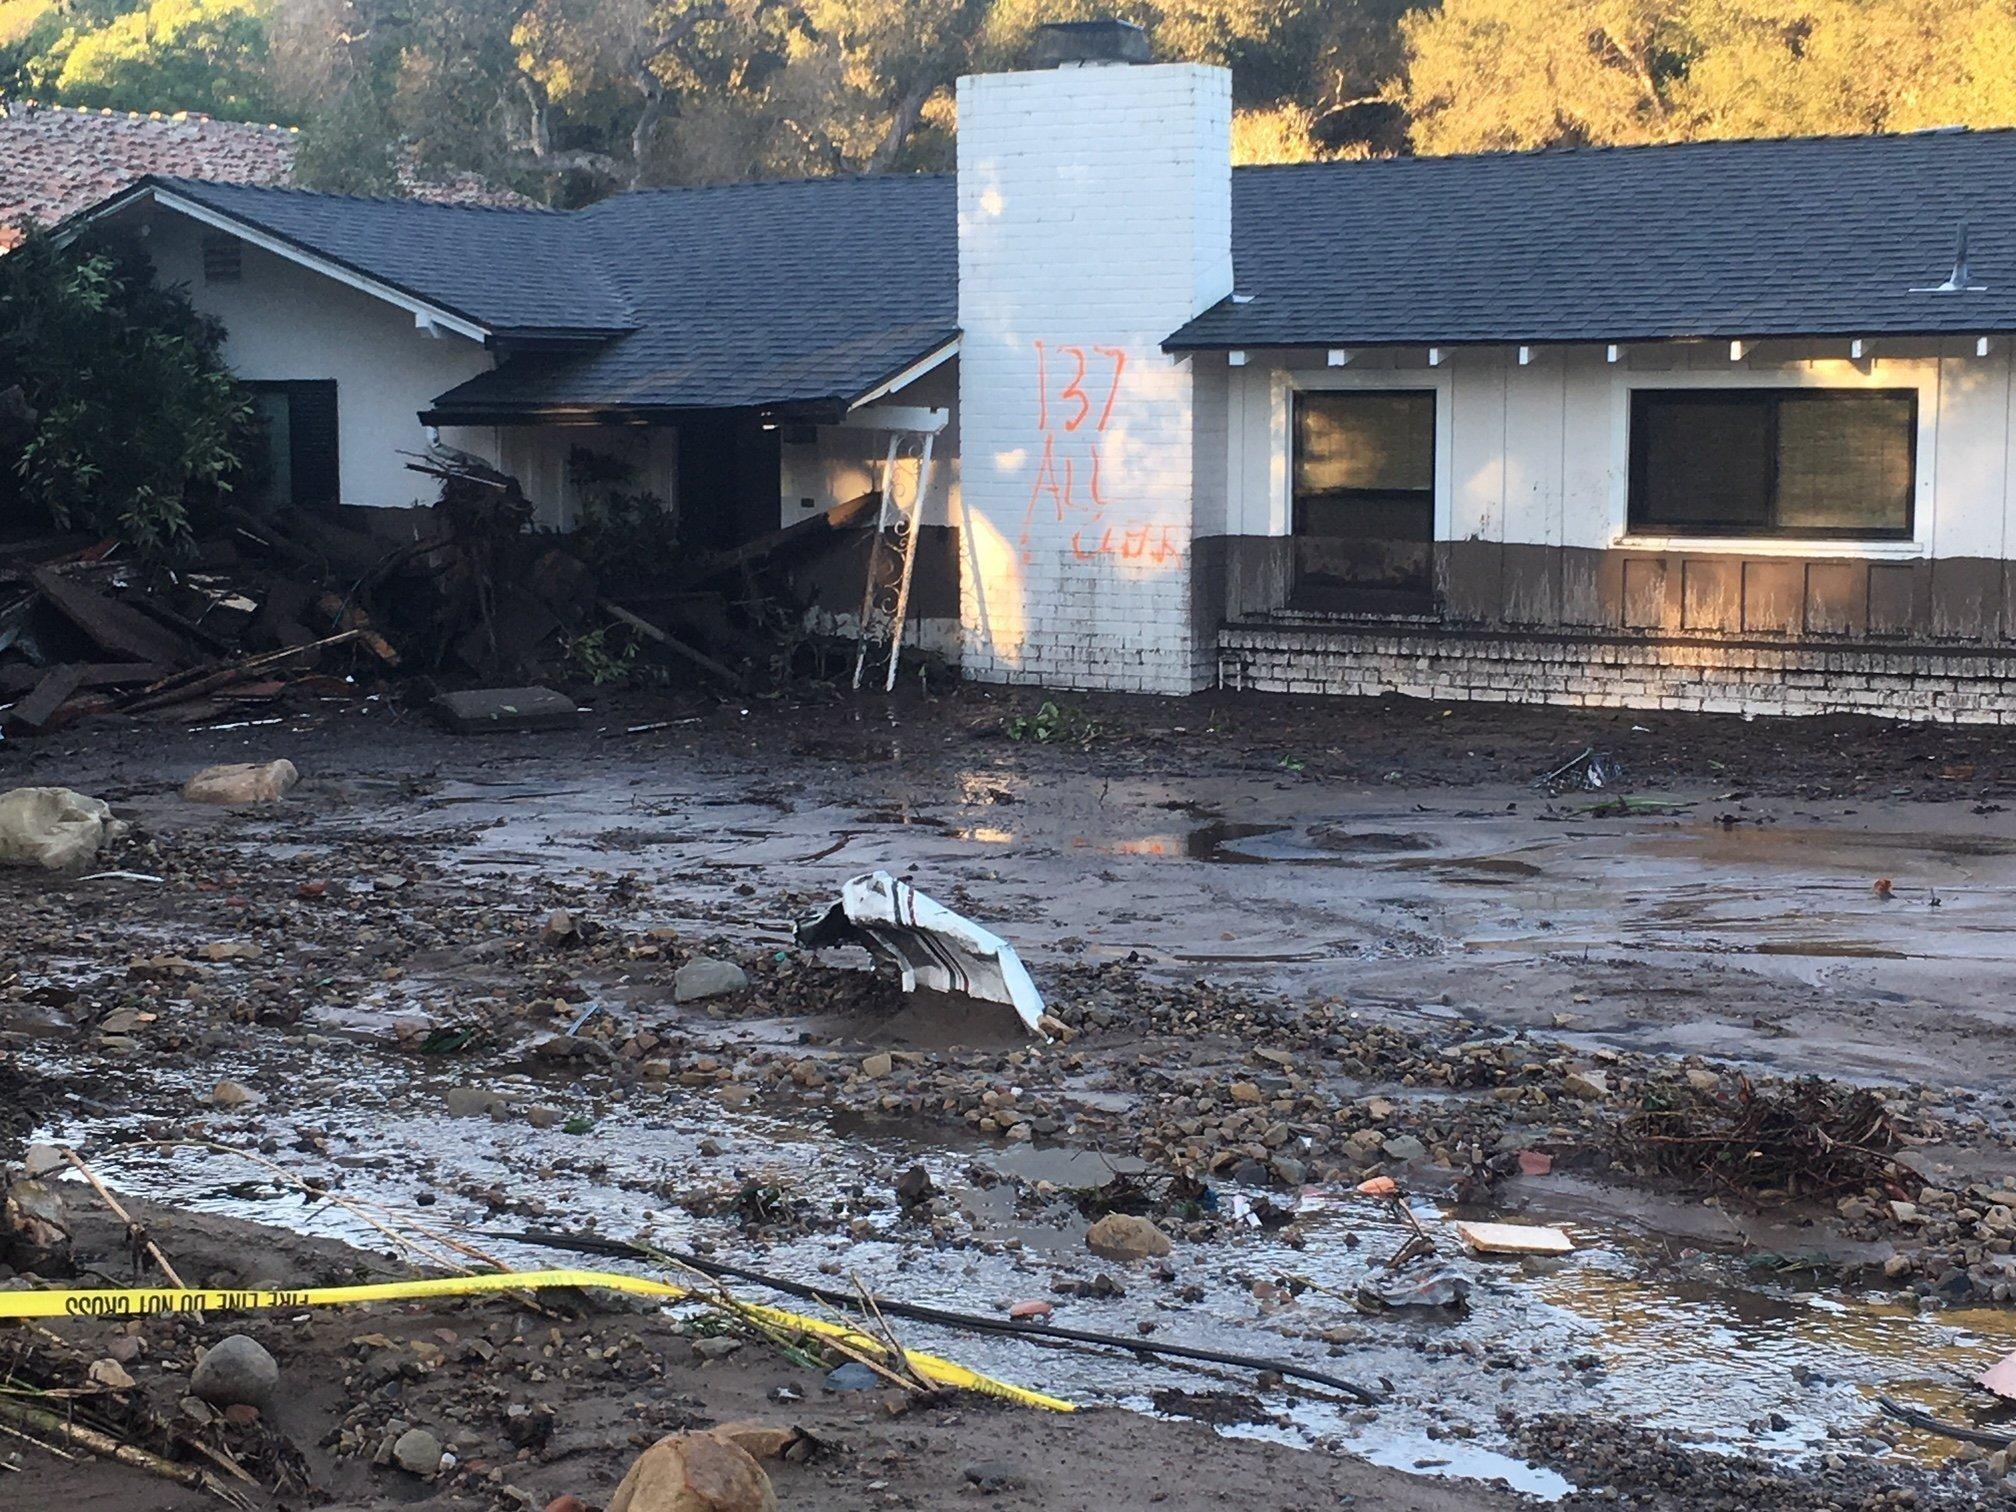 A home ruined in Montecito, California due to mudslides.